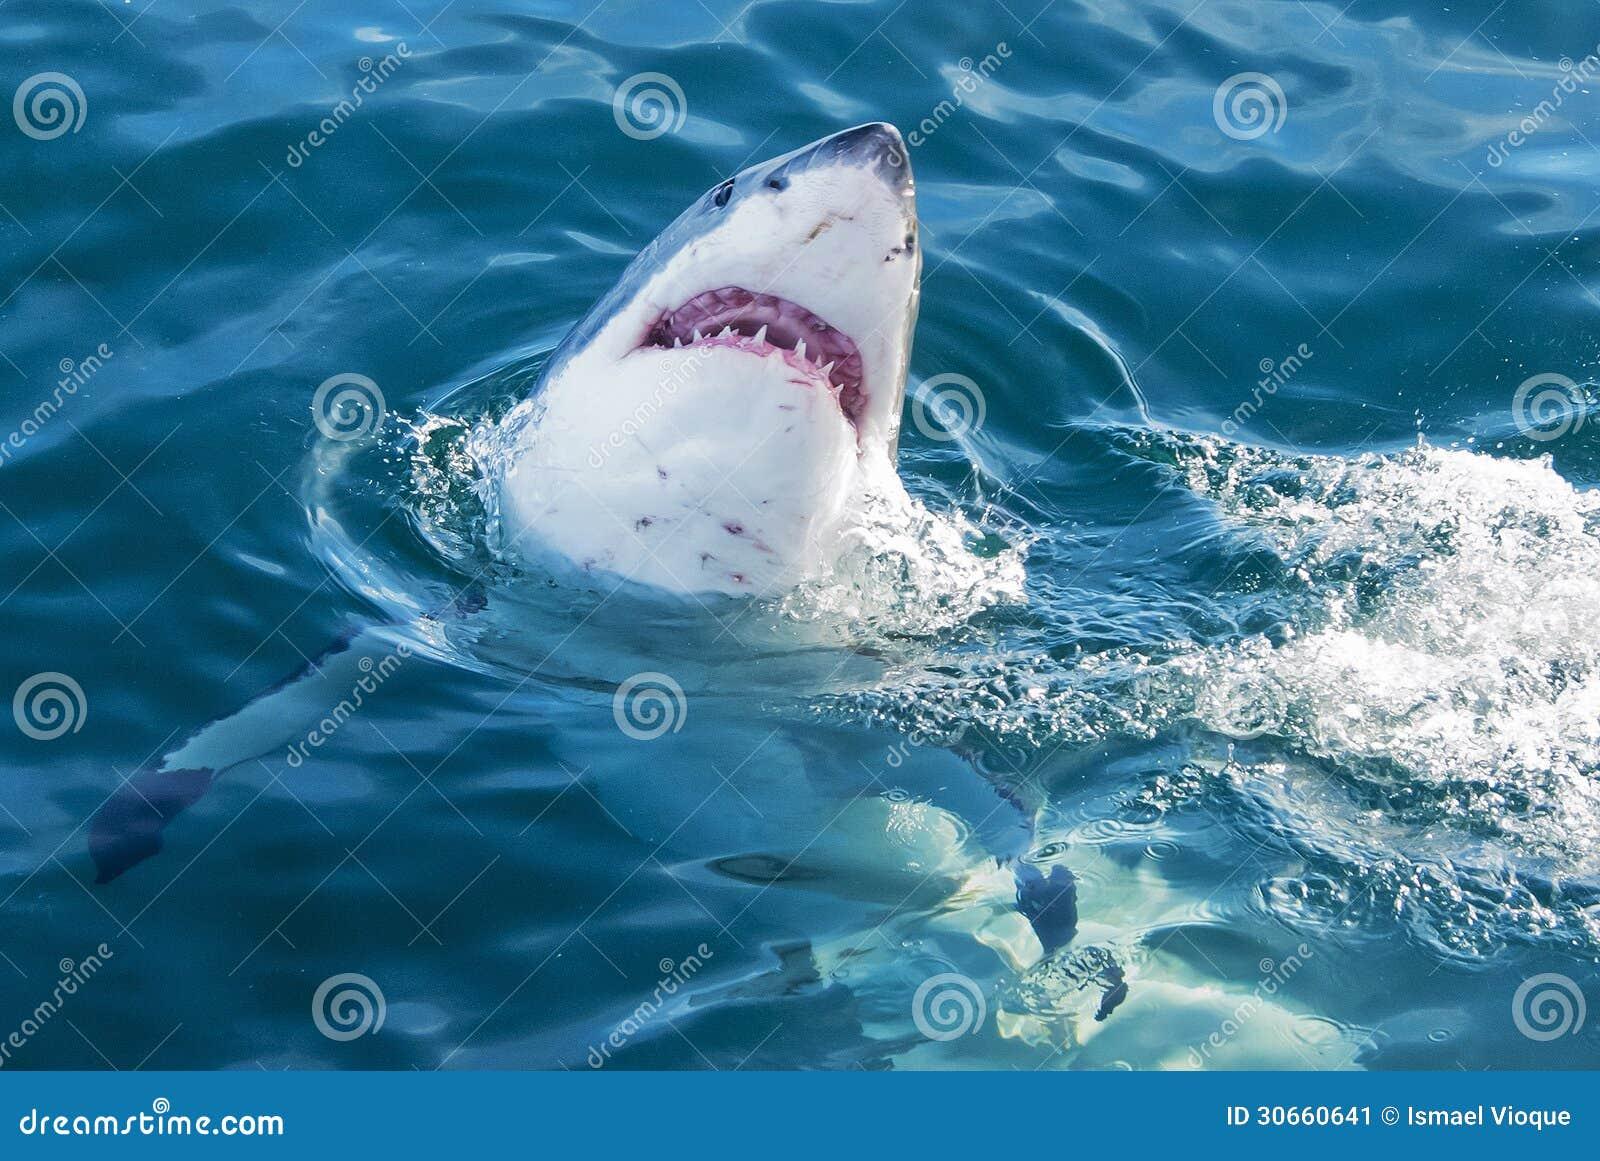 Download Shark attack stock image. Image of predatory, attack - 30660641